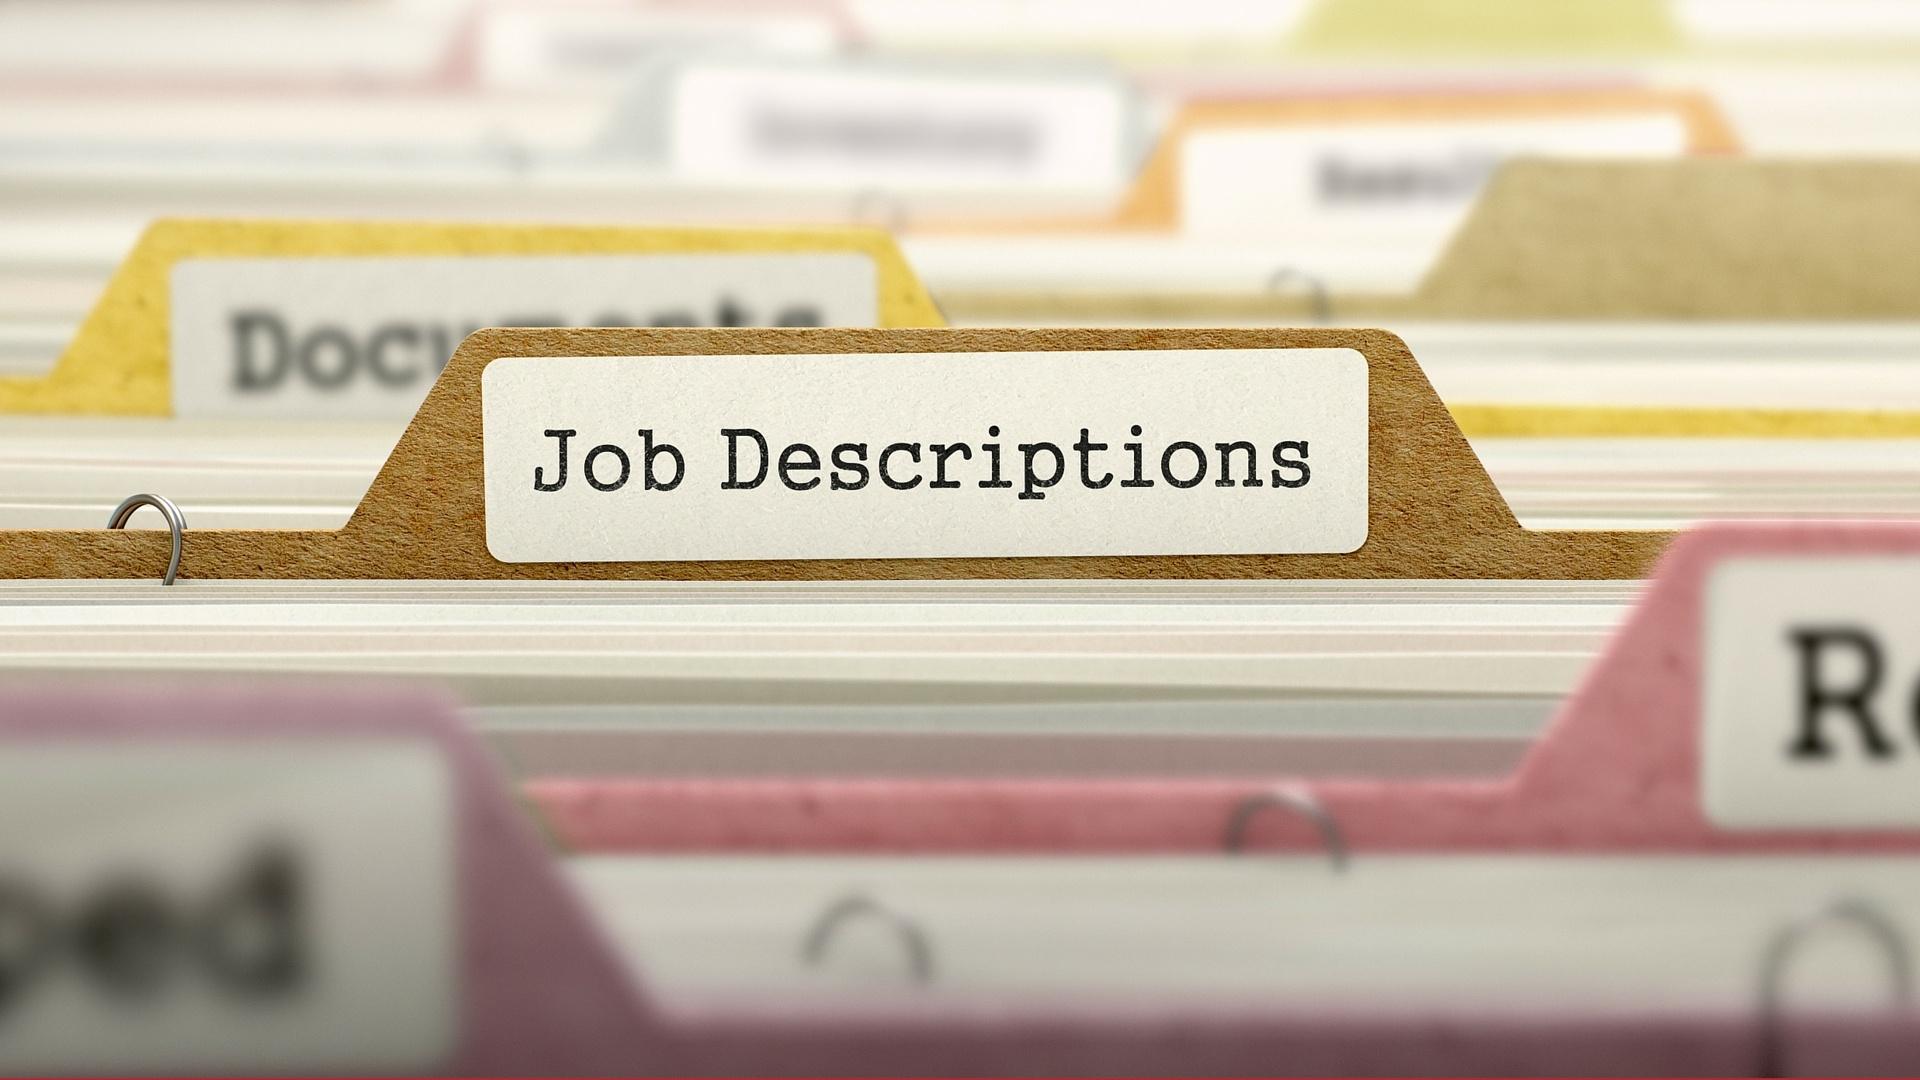 5-Tips-to-Writing-an-Effective-Job-Post.jpg